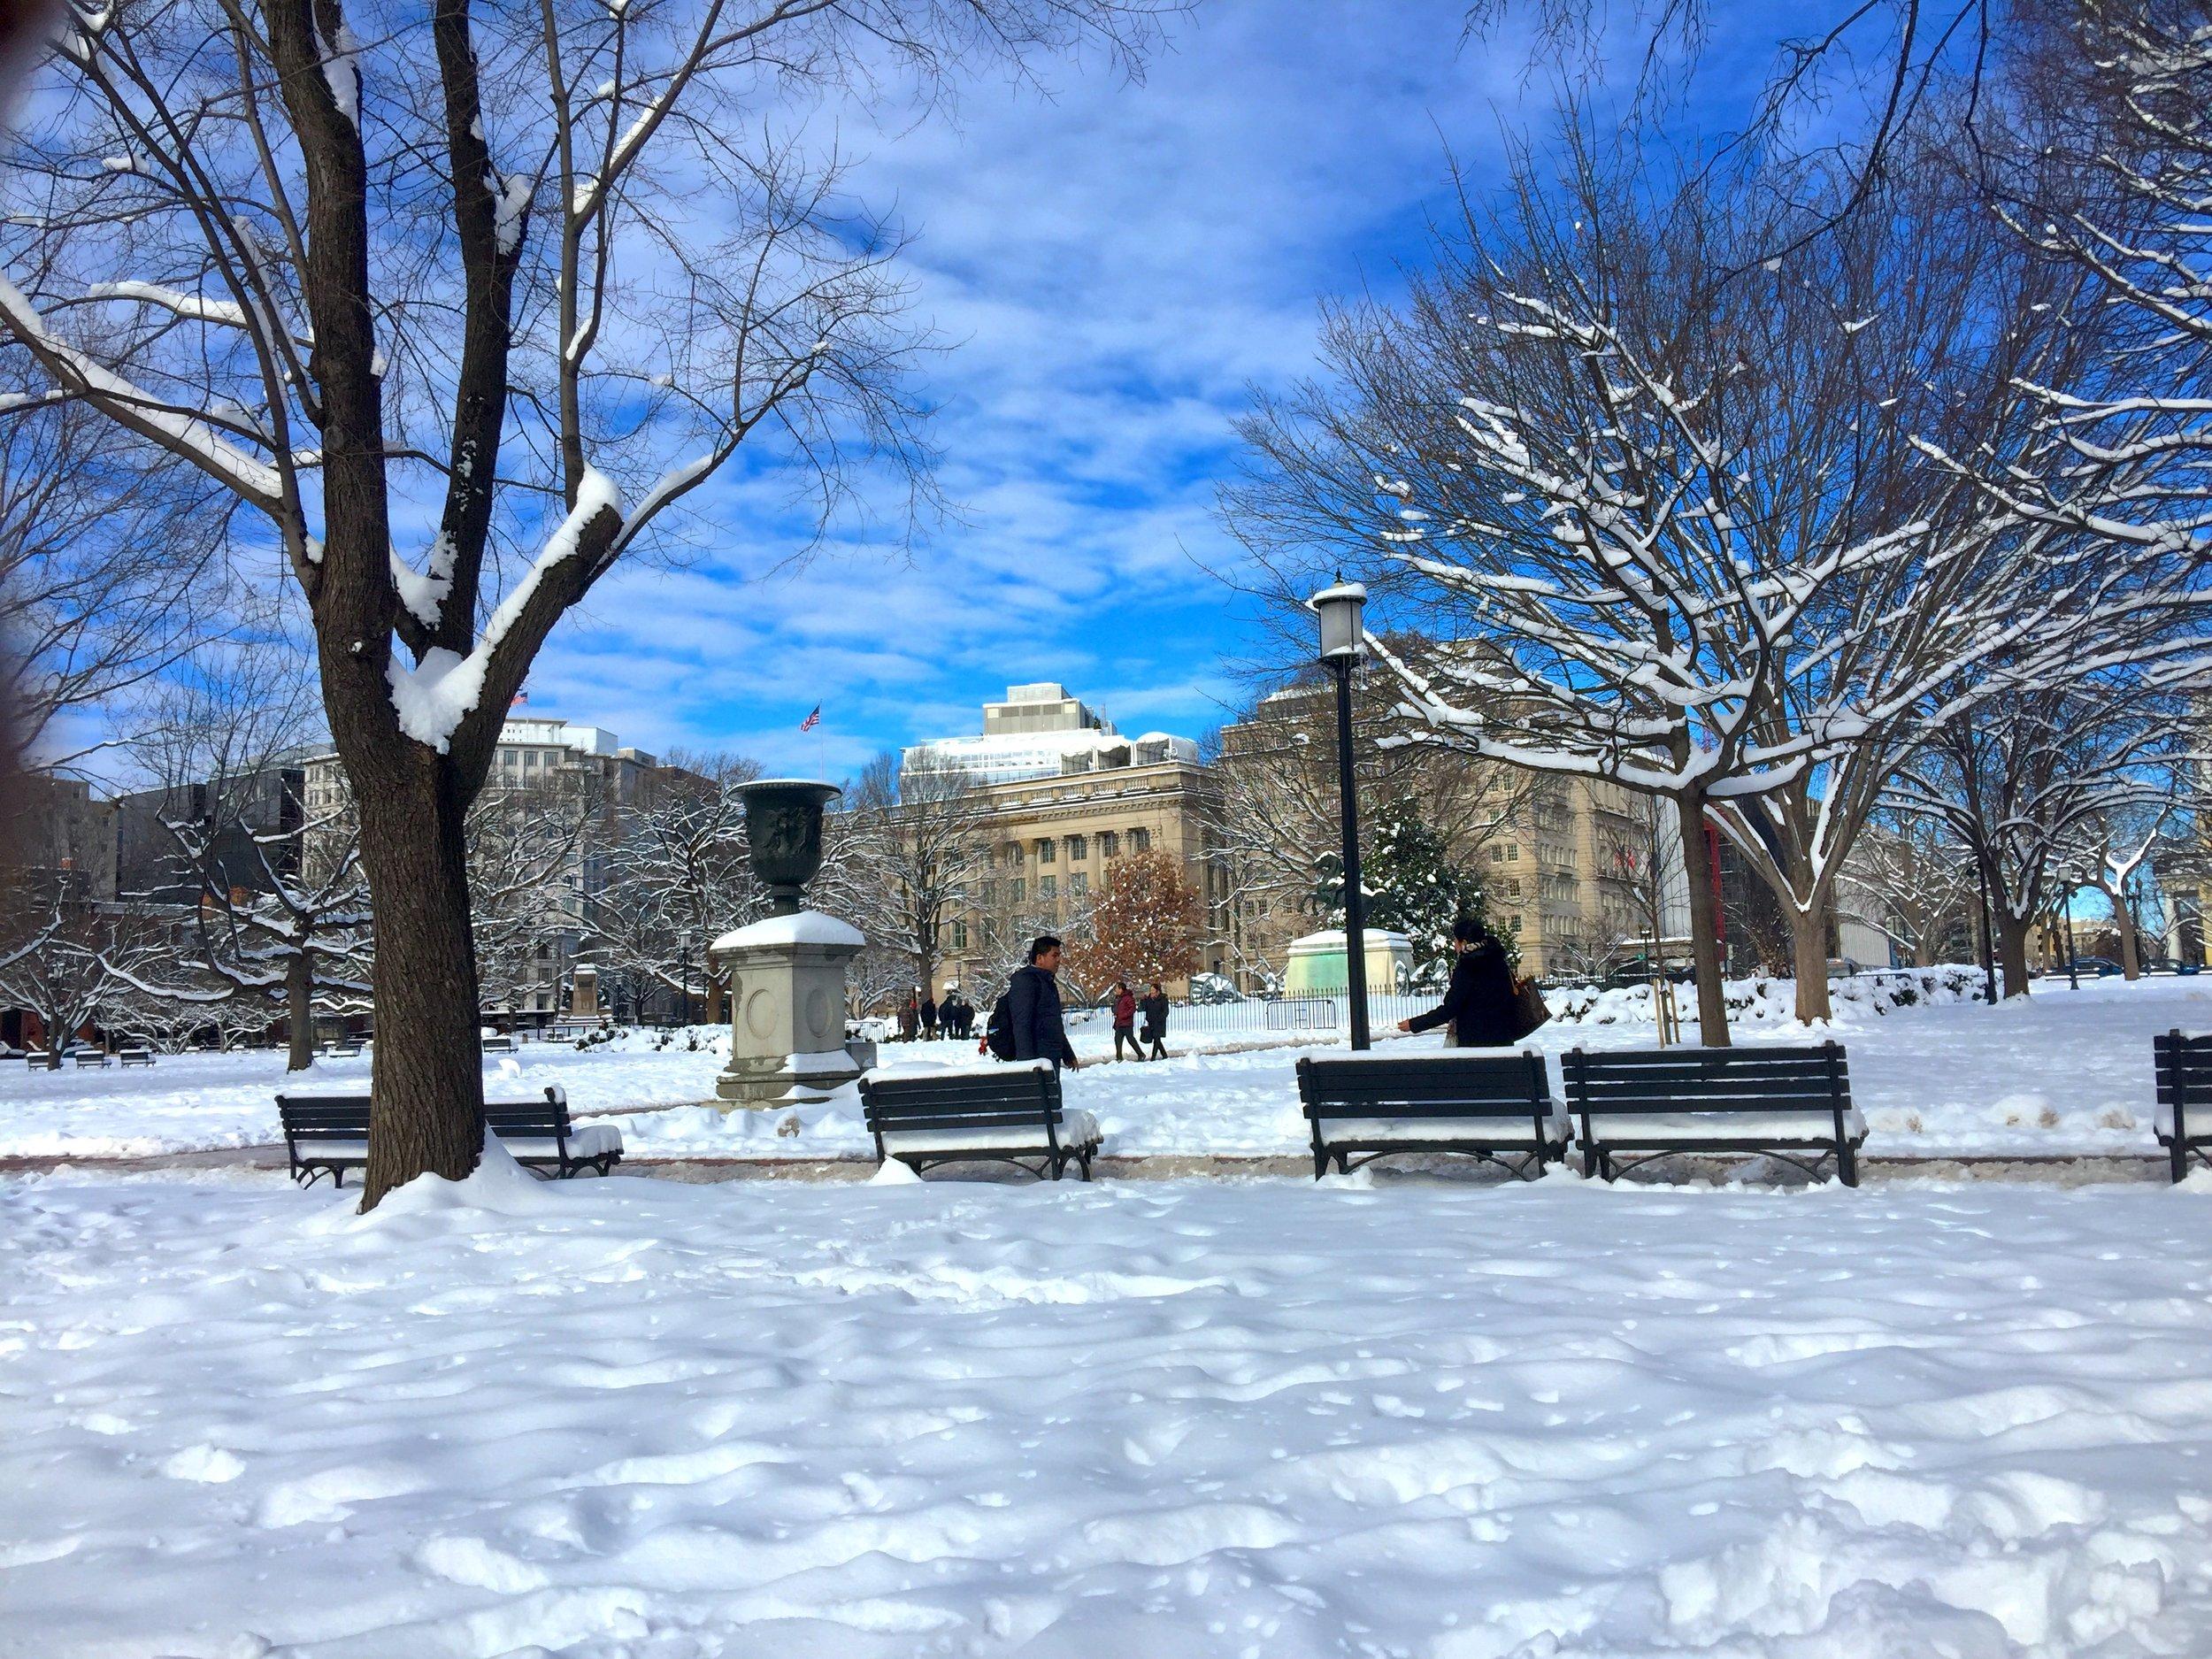 Lafayette Square opposite the White House, on 1/14/2019, by Jennifer Zeng 曾錚攝於白宮對面Lafayette广場。2019年1月14日